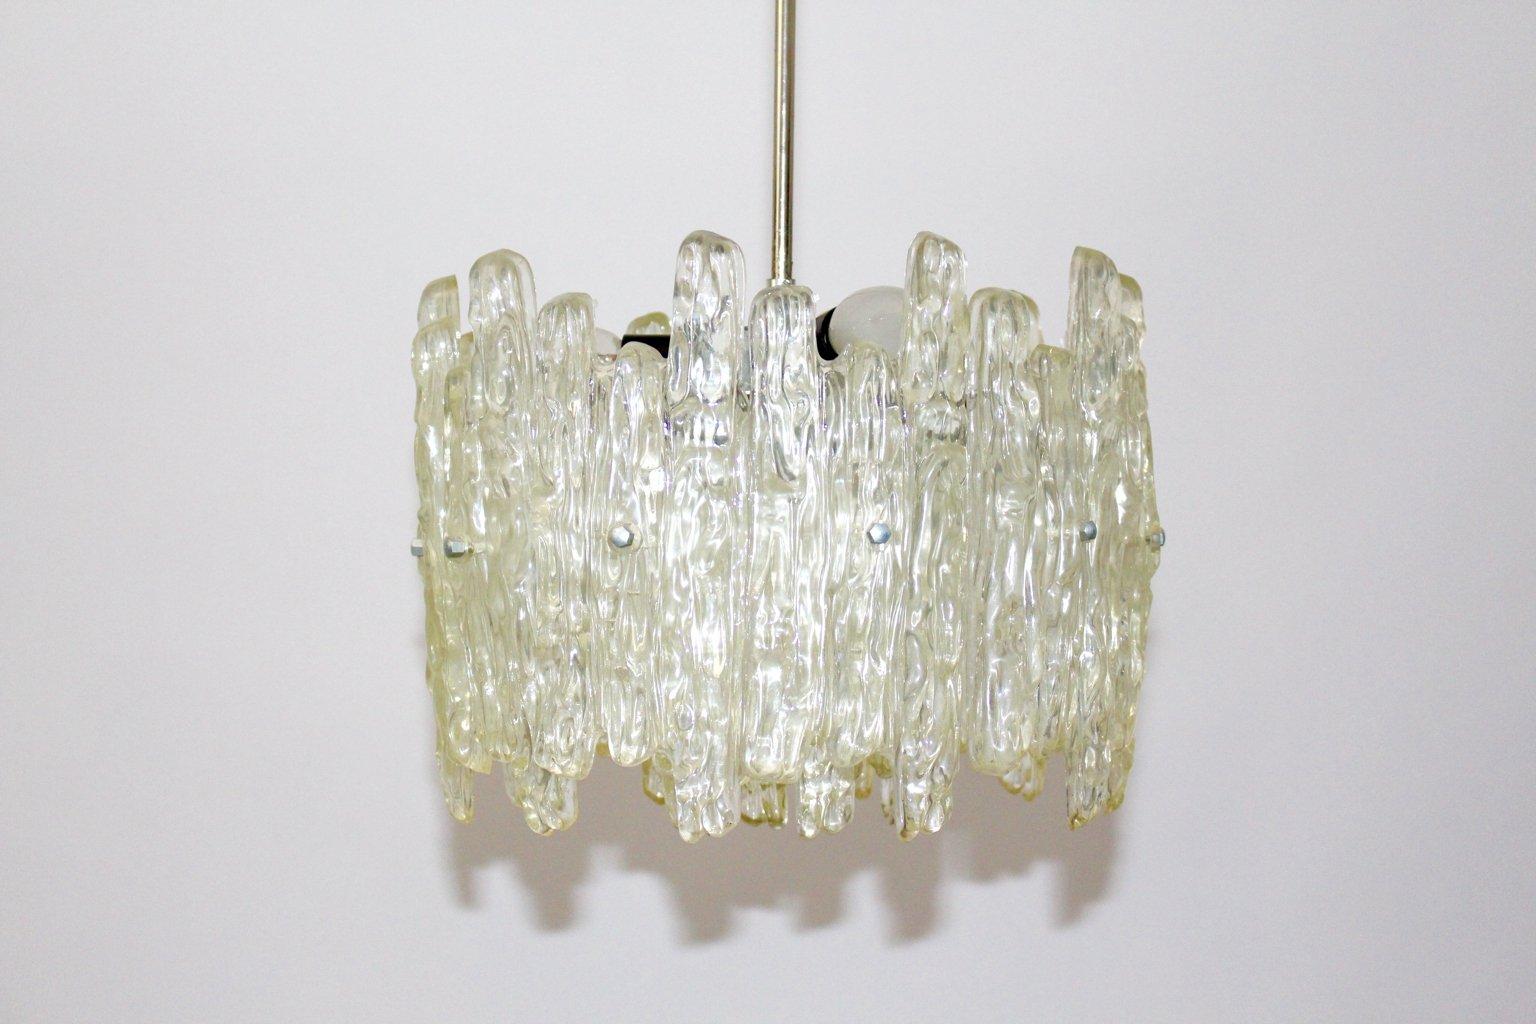 Lampadario vetro satinato bianco lampadario vetro satinato